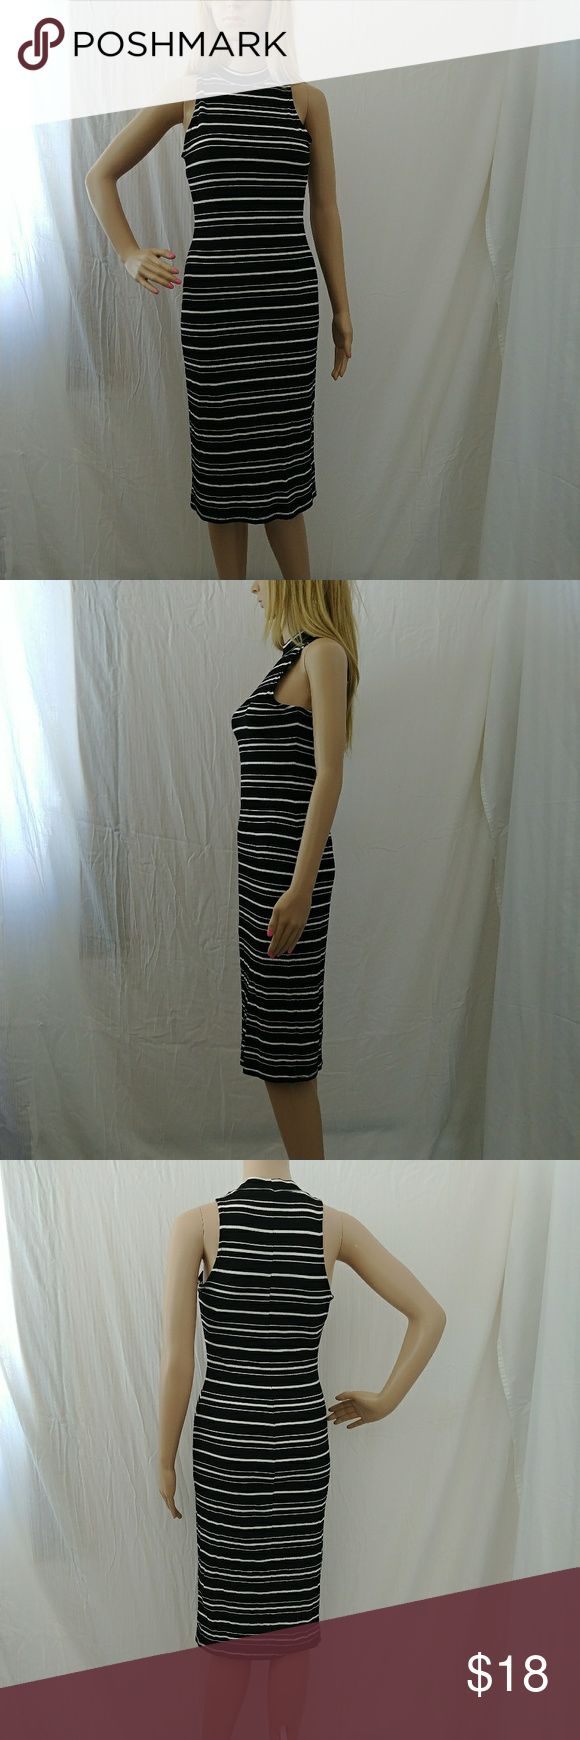 New Autumn Daze striped dress Cute form fitting striped tube dress Xhilaration Dresses Midi